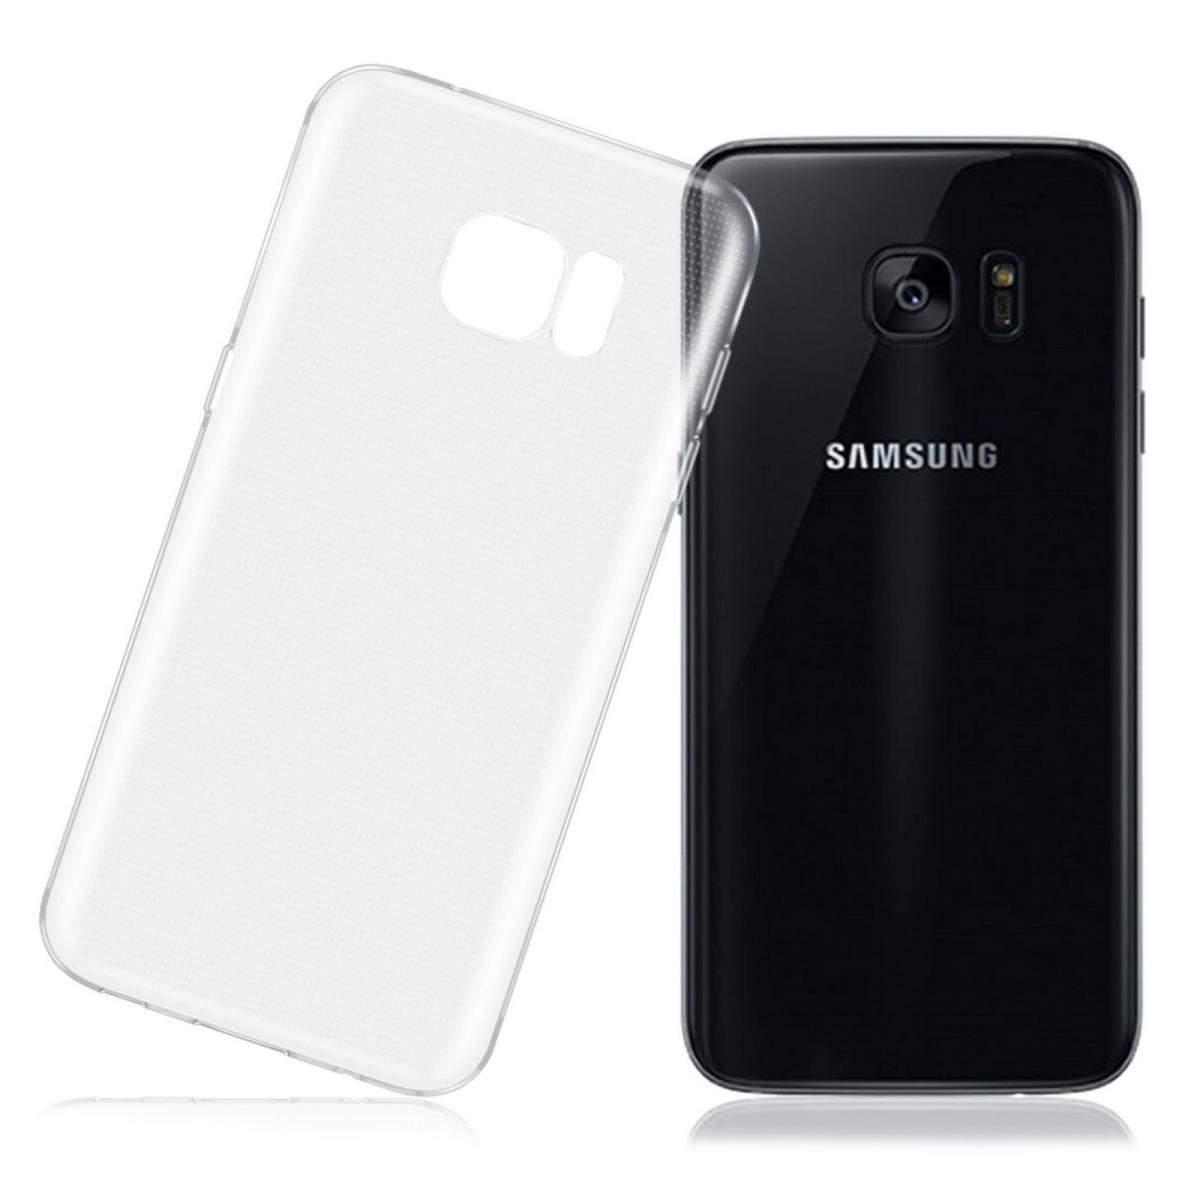 341024508c0 Funda de gel TPU carcasa silicona para Samsung Galaxy S7 Edge Transparente